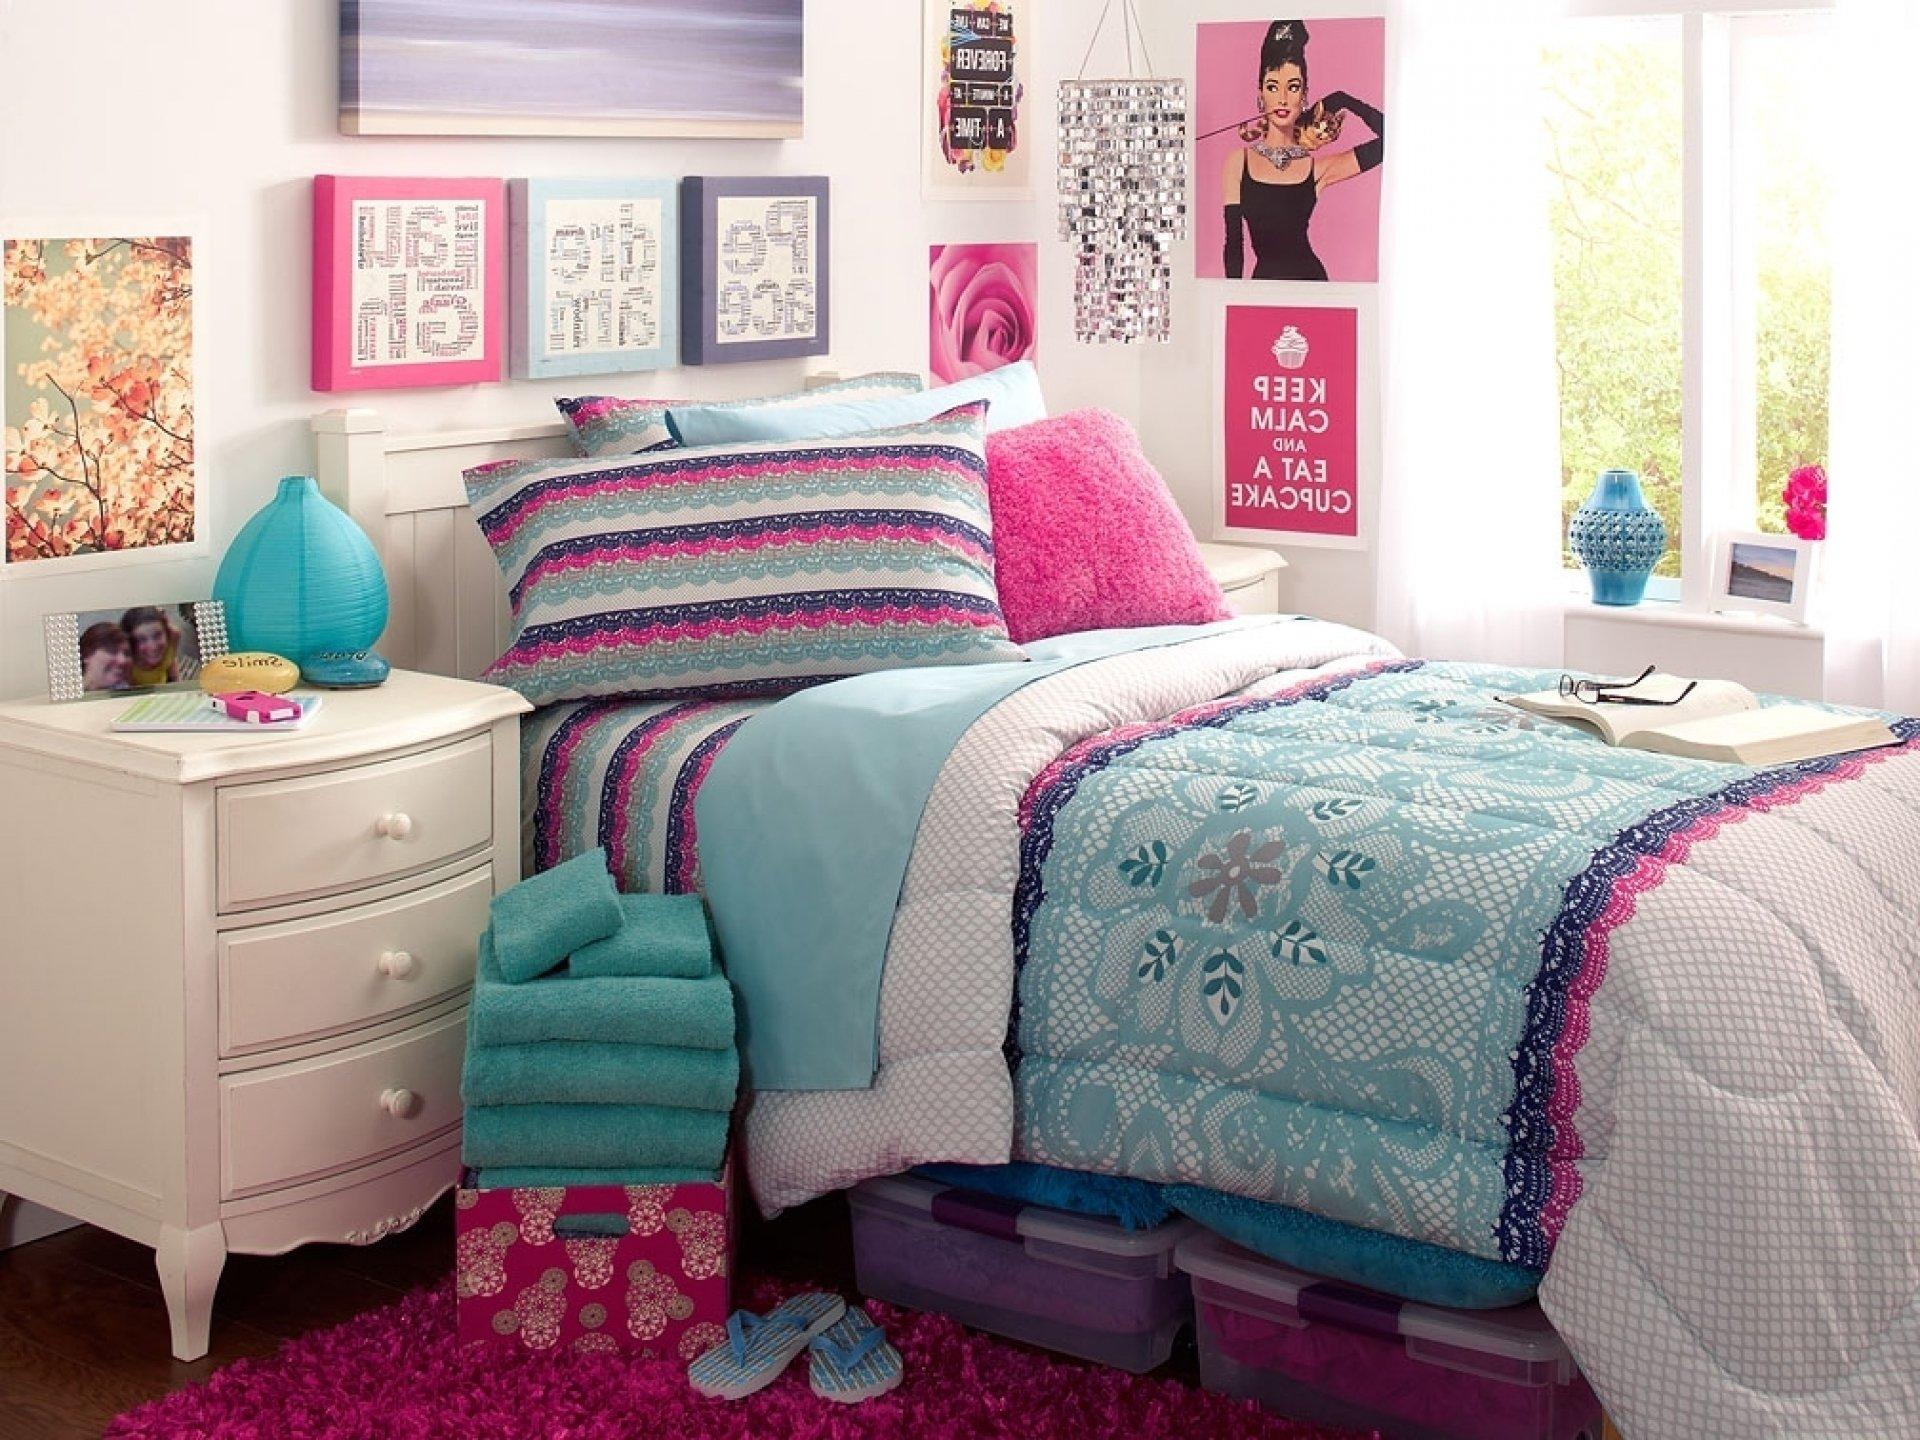 10 Stylish Teenage Girl Bedroom Decorating Ideas girly girl bedroom ideas e280a2 bedroom ideas 2020